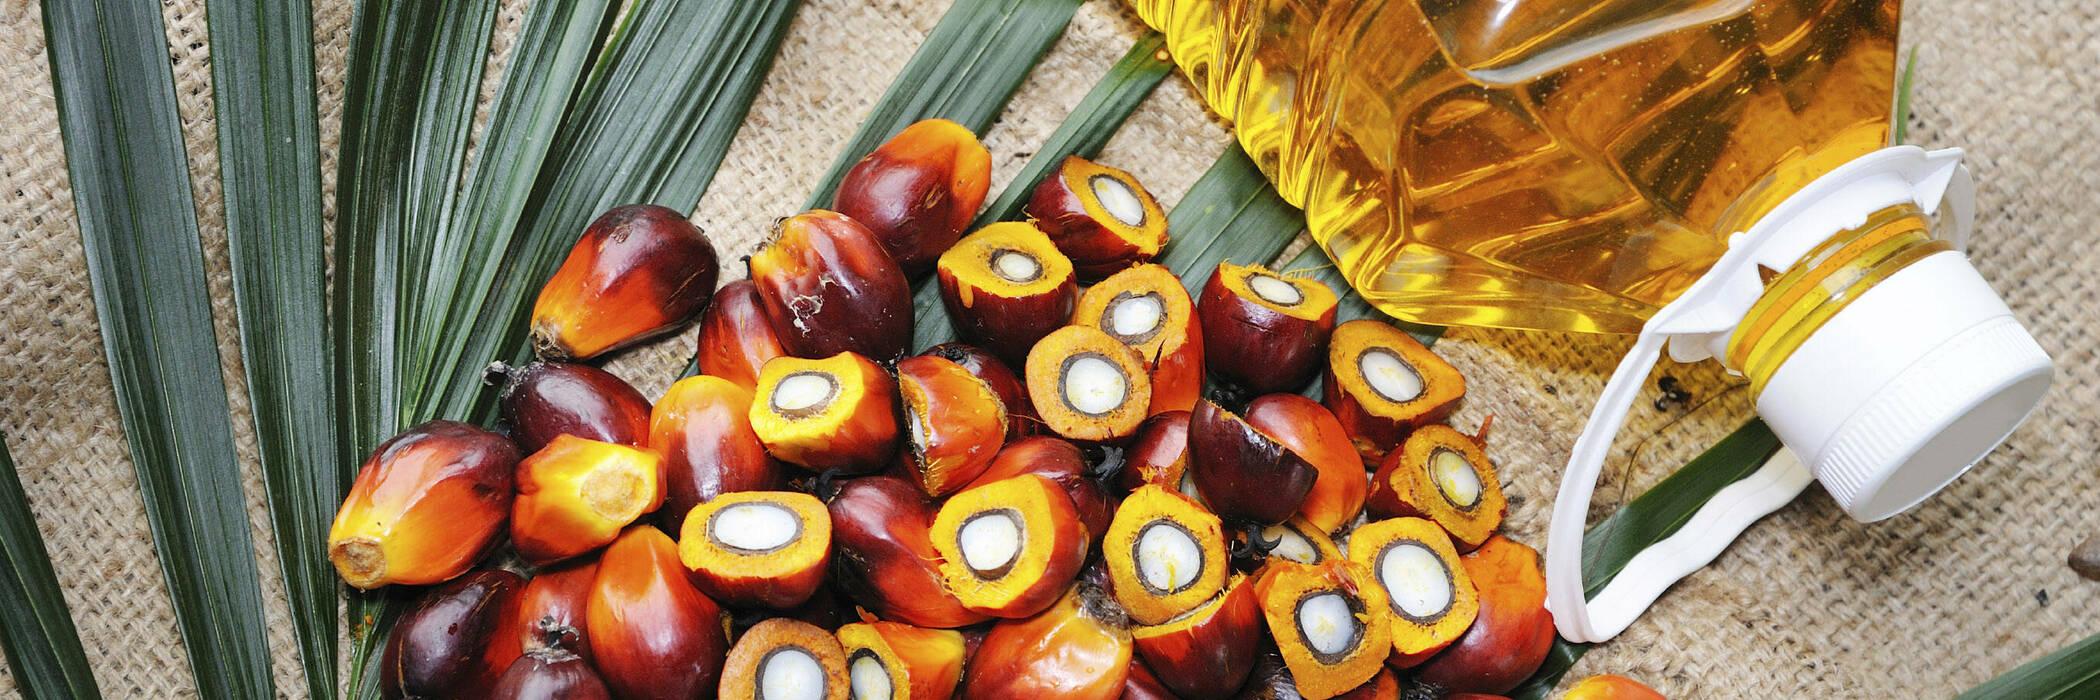 16mar palm oil hero